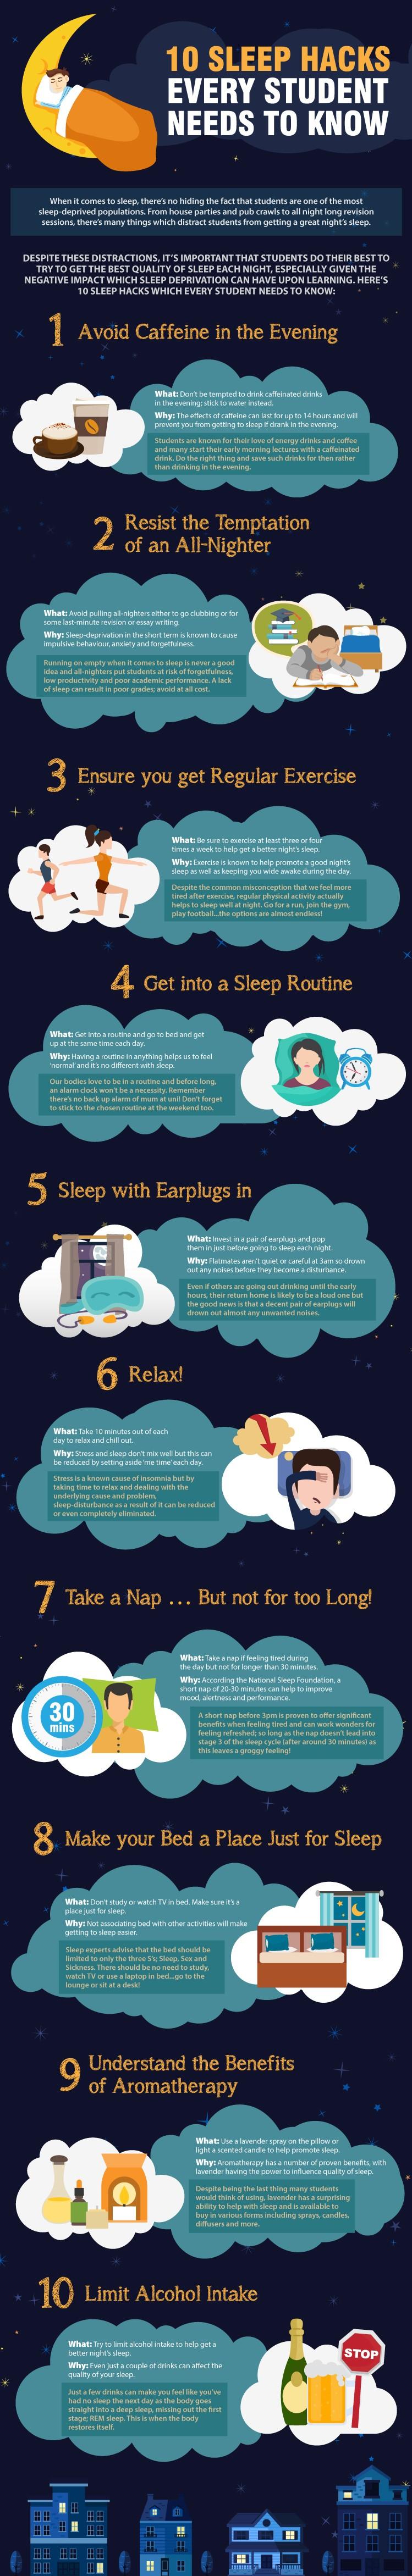 10 sleep hacks